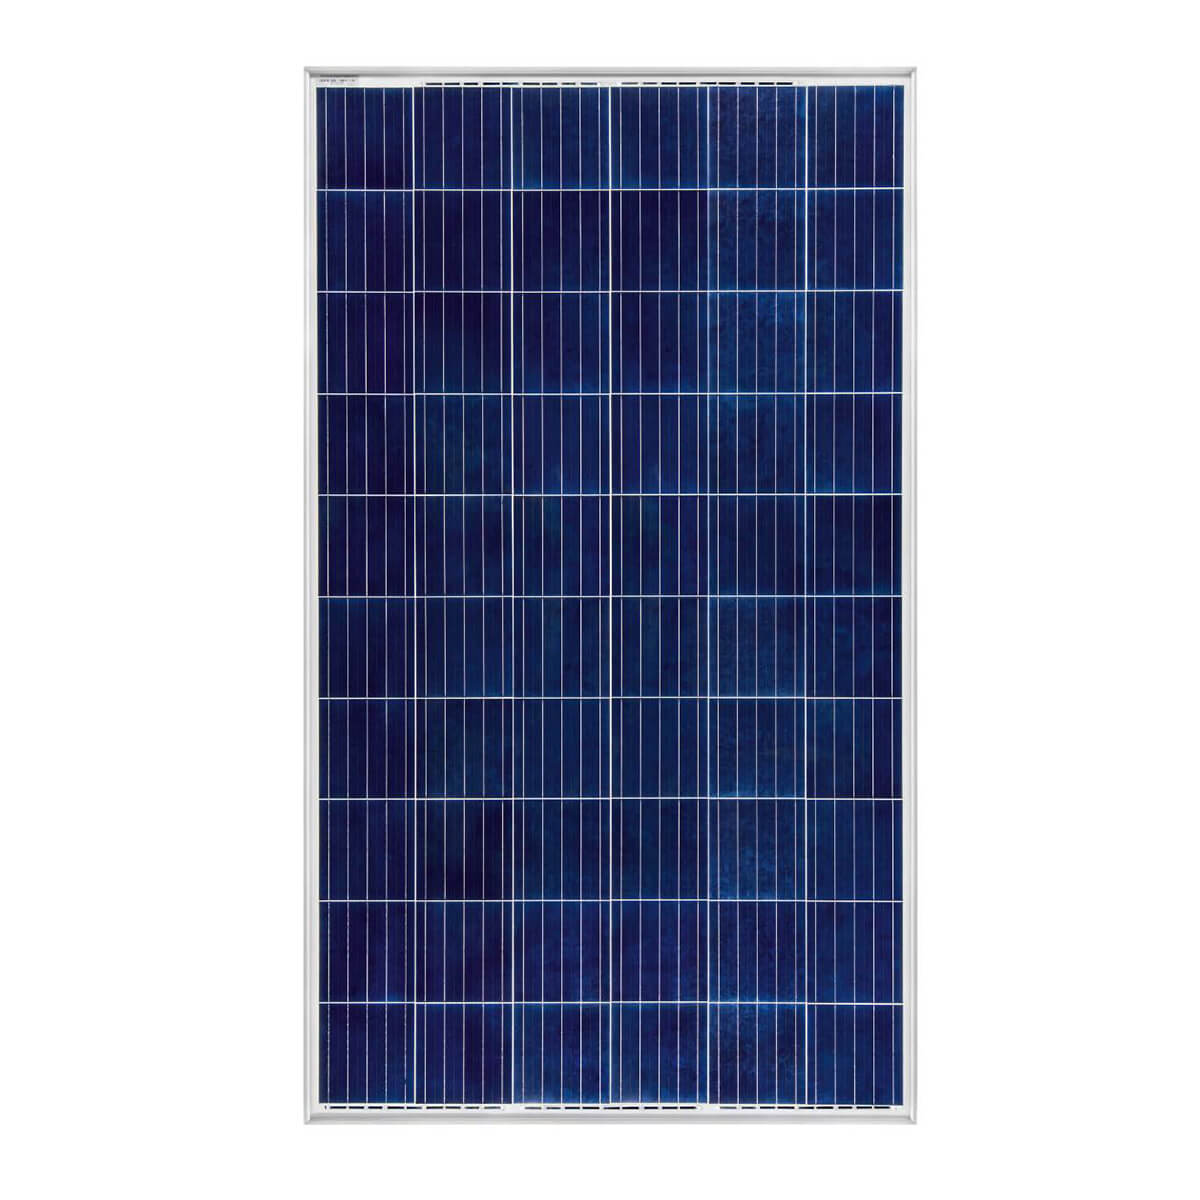 Odul solar 285W panel, odul solar 285Watt panel, Odul solar 285 W panel, odul solar 285 Watt panel, odul solar 285 Watt polikristal panel, Odul solar 285 W watt gunes paneli, odul solar 285 W watt polikristal gunes paneli, odul solar 285 W Watt fotovoltaik polikristal solar panel, odul solar 285W polikristal gunes enerjisi, odul solar OSPp60-285W panel, ÖDÜL SOLAR 285 WATT